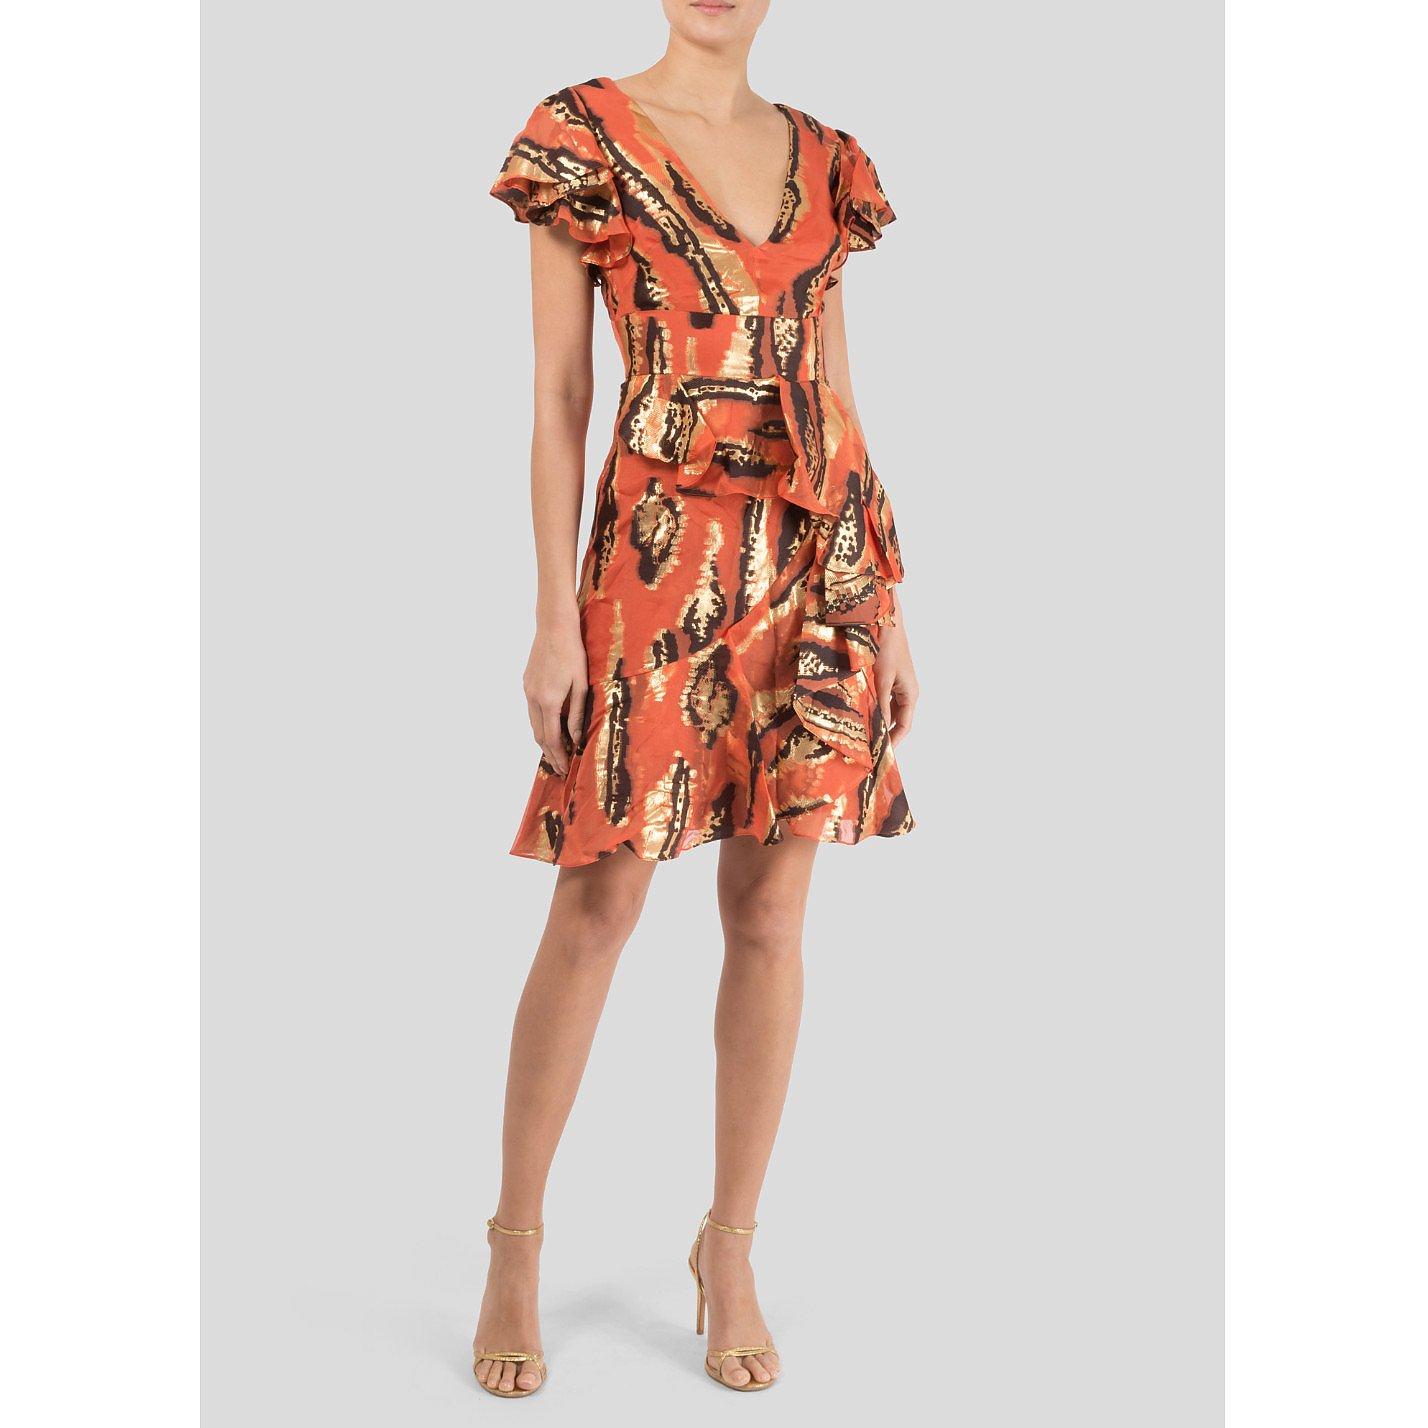 Temperley London Audrey Mini Dress